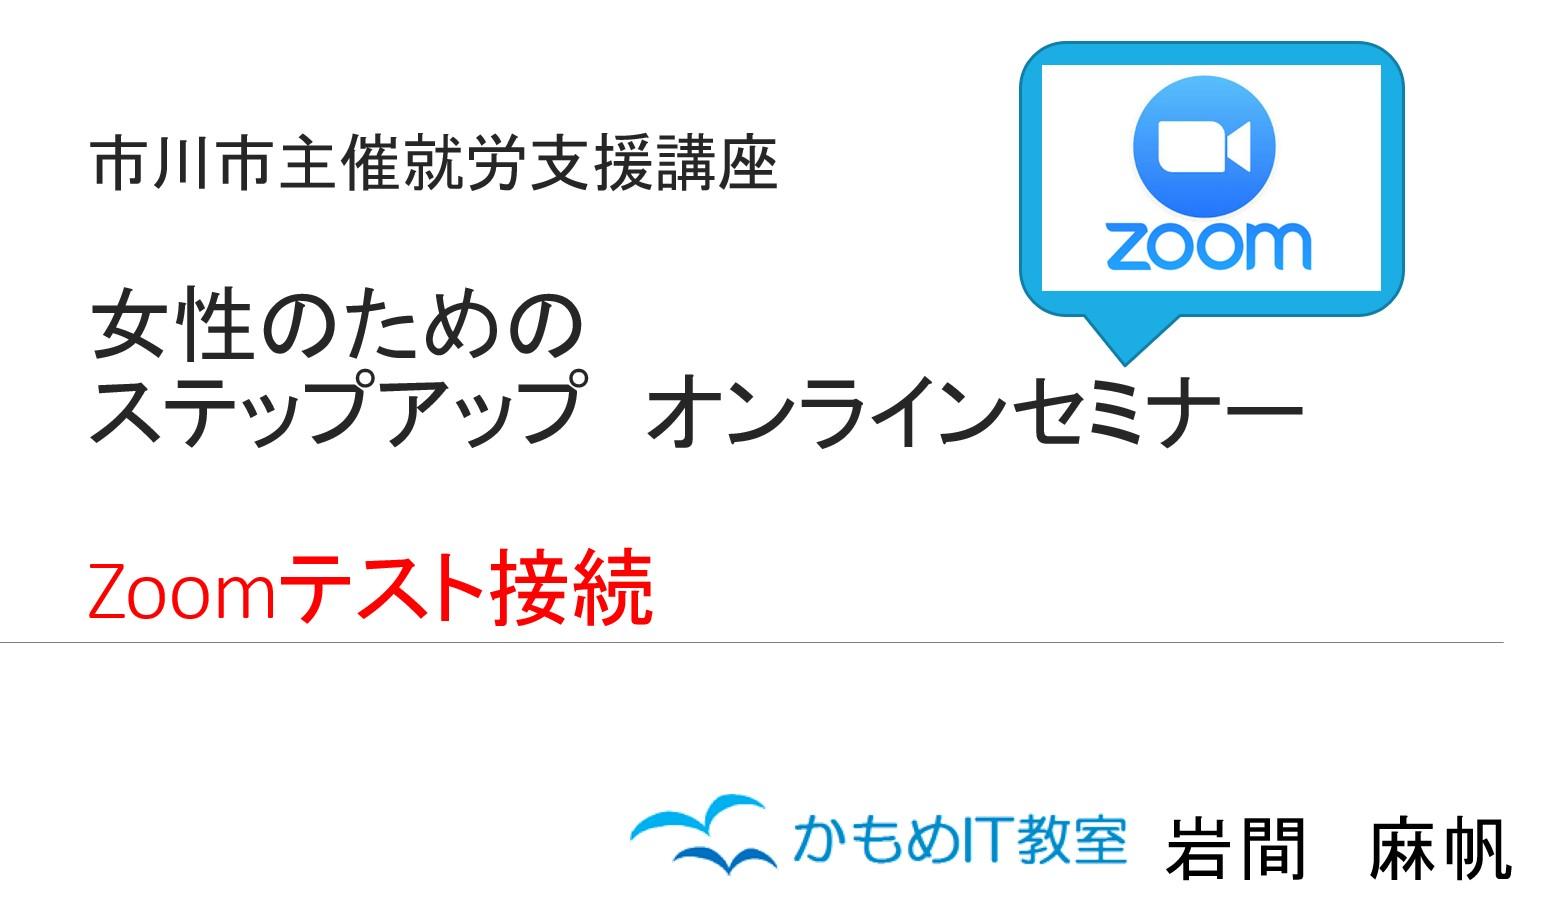 Zoomテスト接続サイト